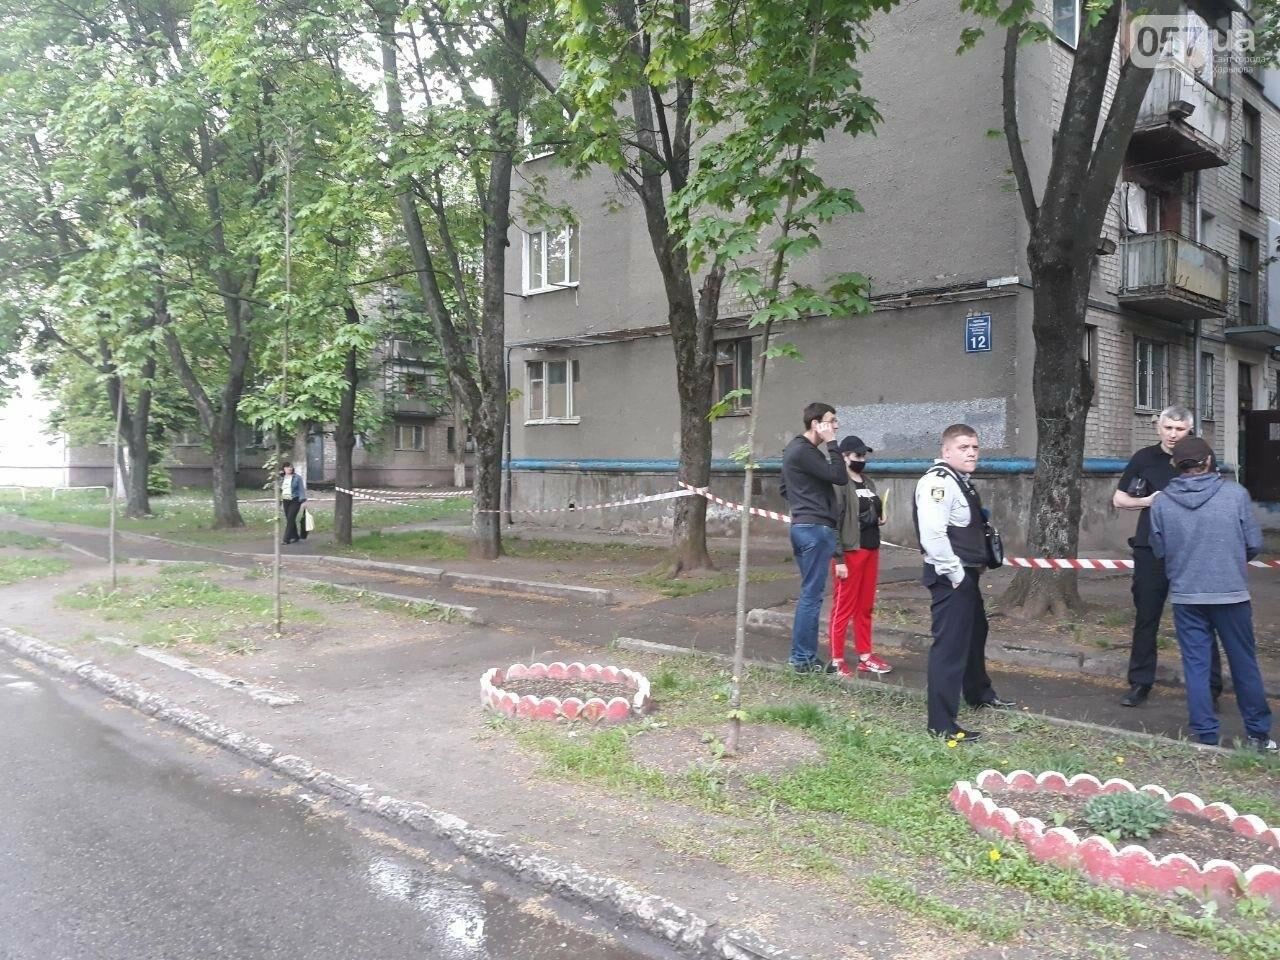 В Харькове силовики оцепили «пятиэтажку» и искали взрывчатку, - ФОТО, фото-2